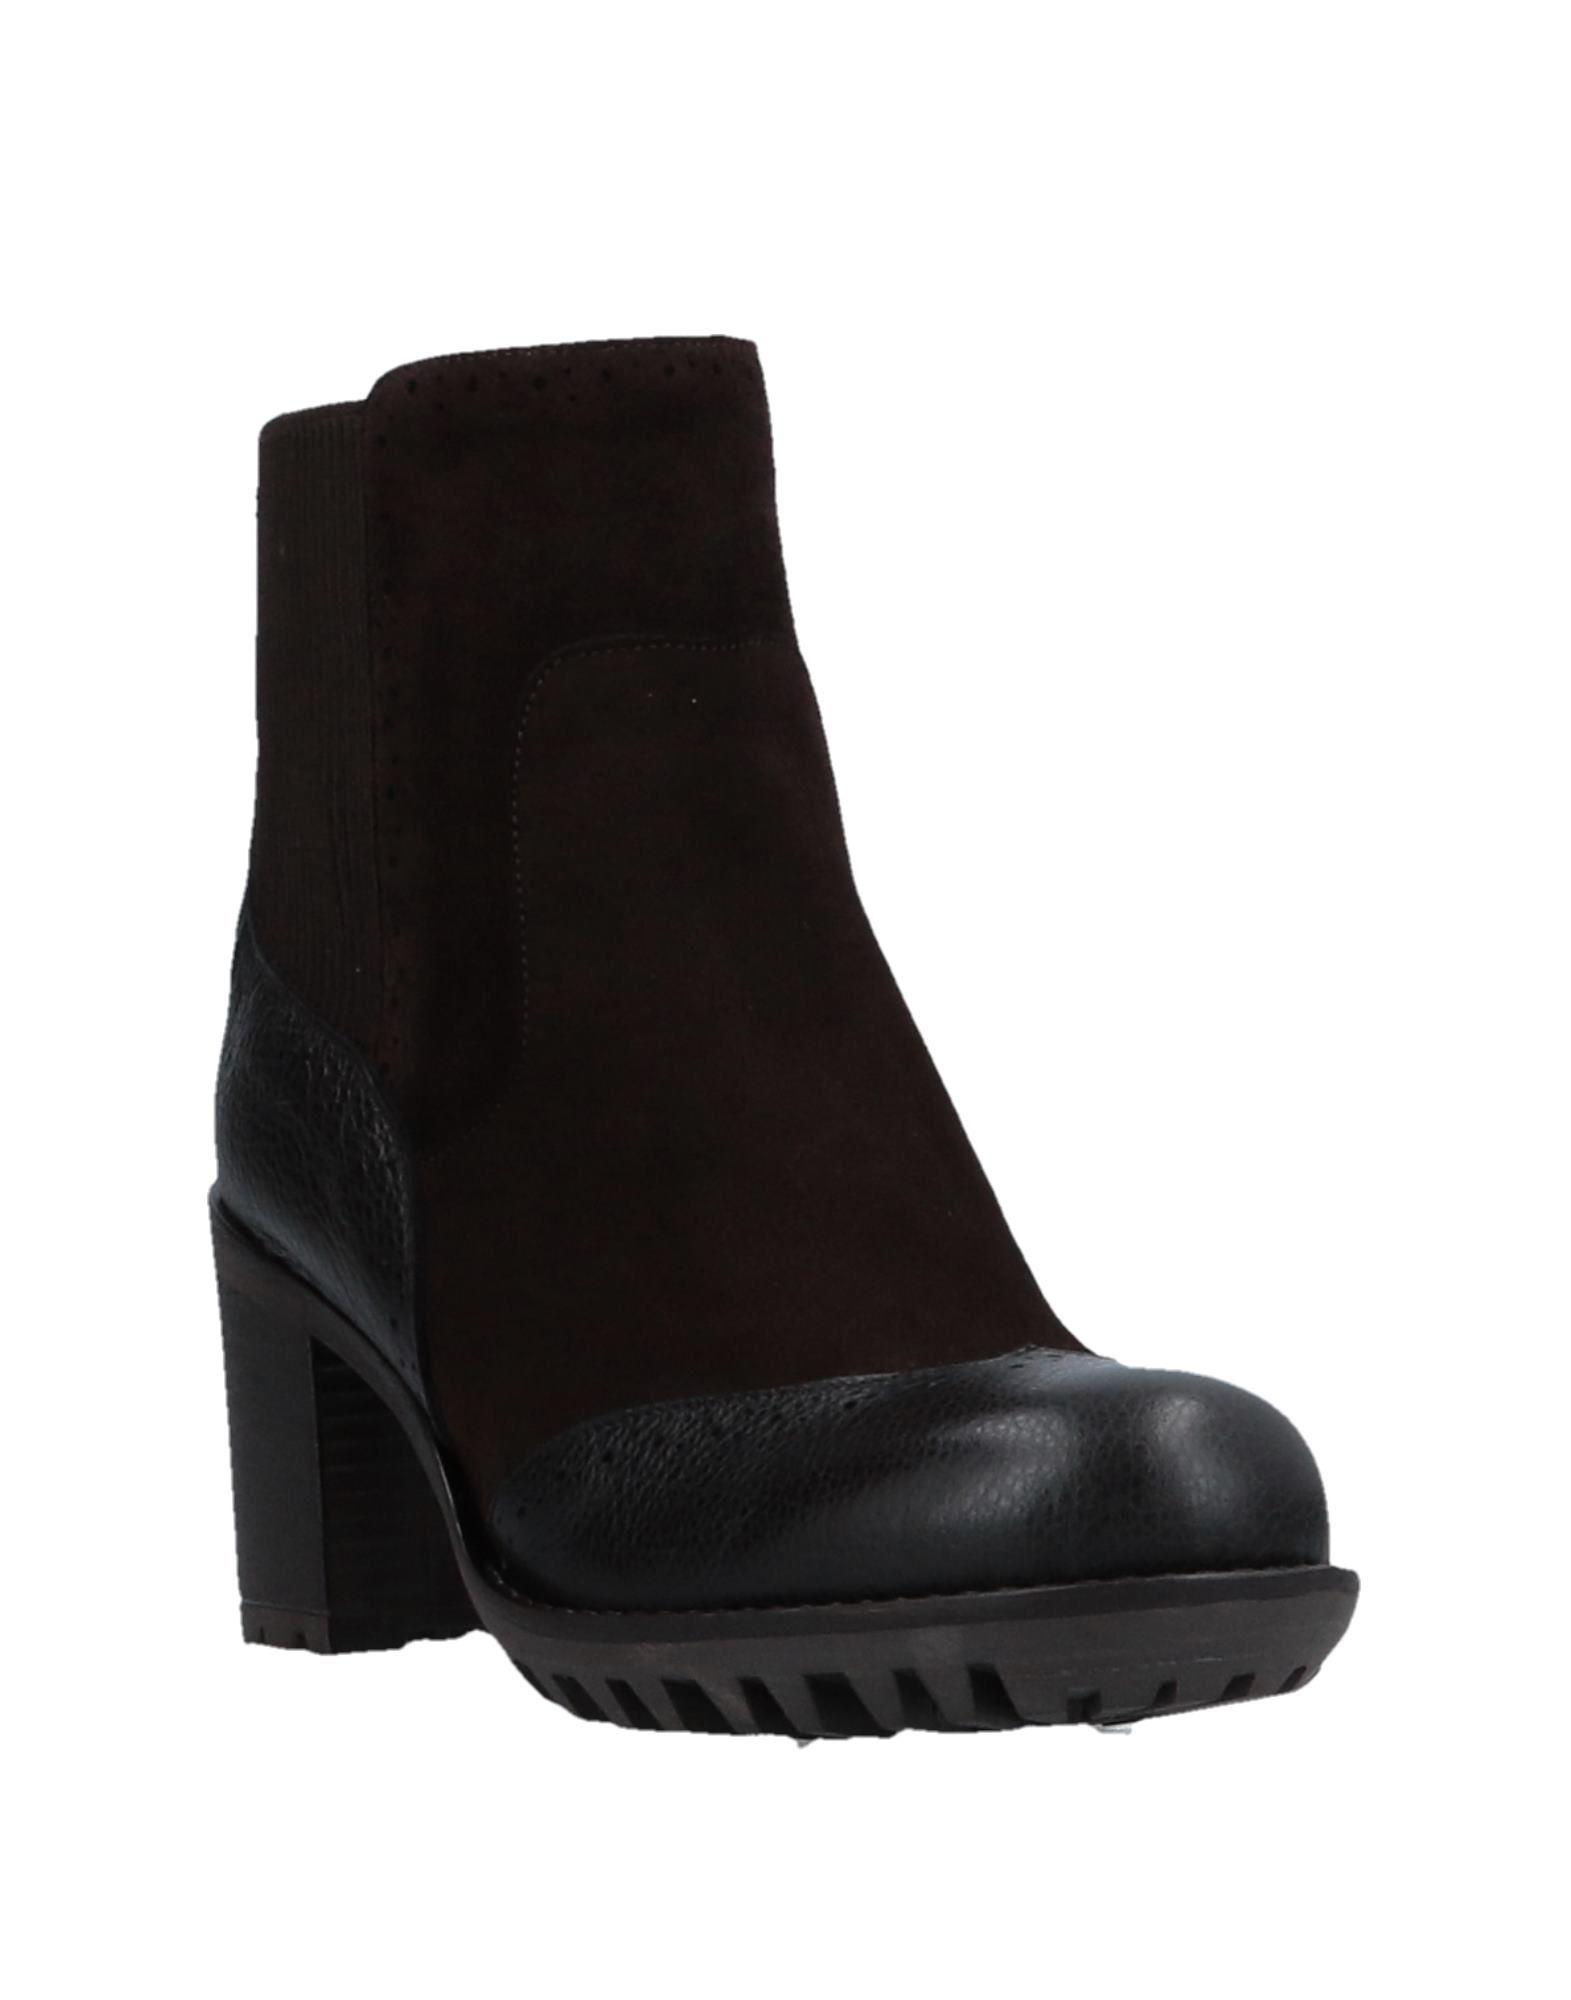 Stilvolle billige Stiefel Schuhe Fiorangelo Chelsea Stiefel billige Damen  11510677CF a97a8a